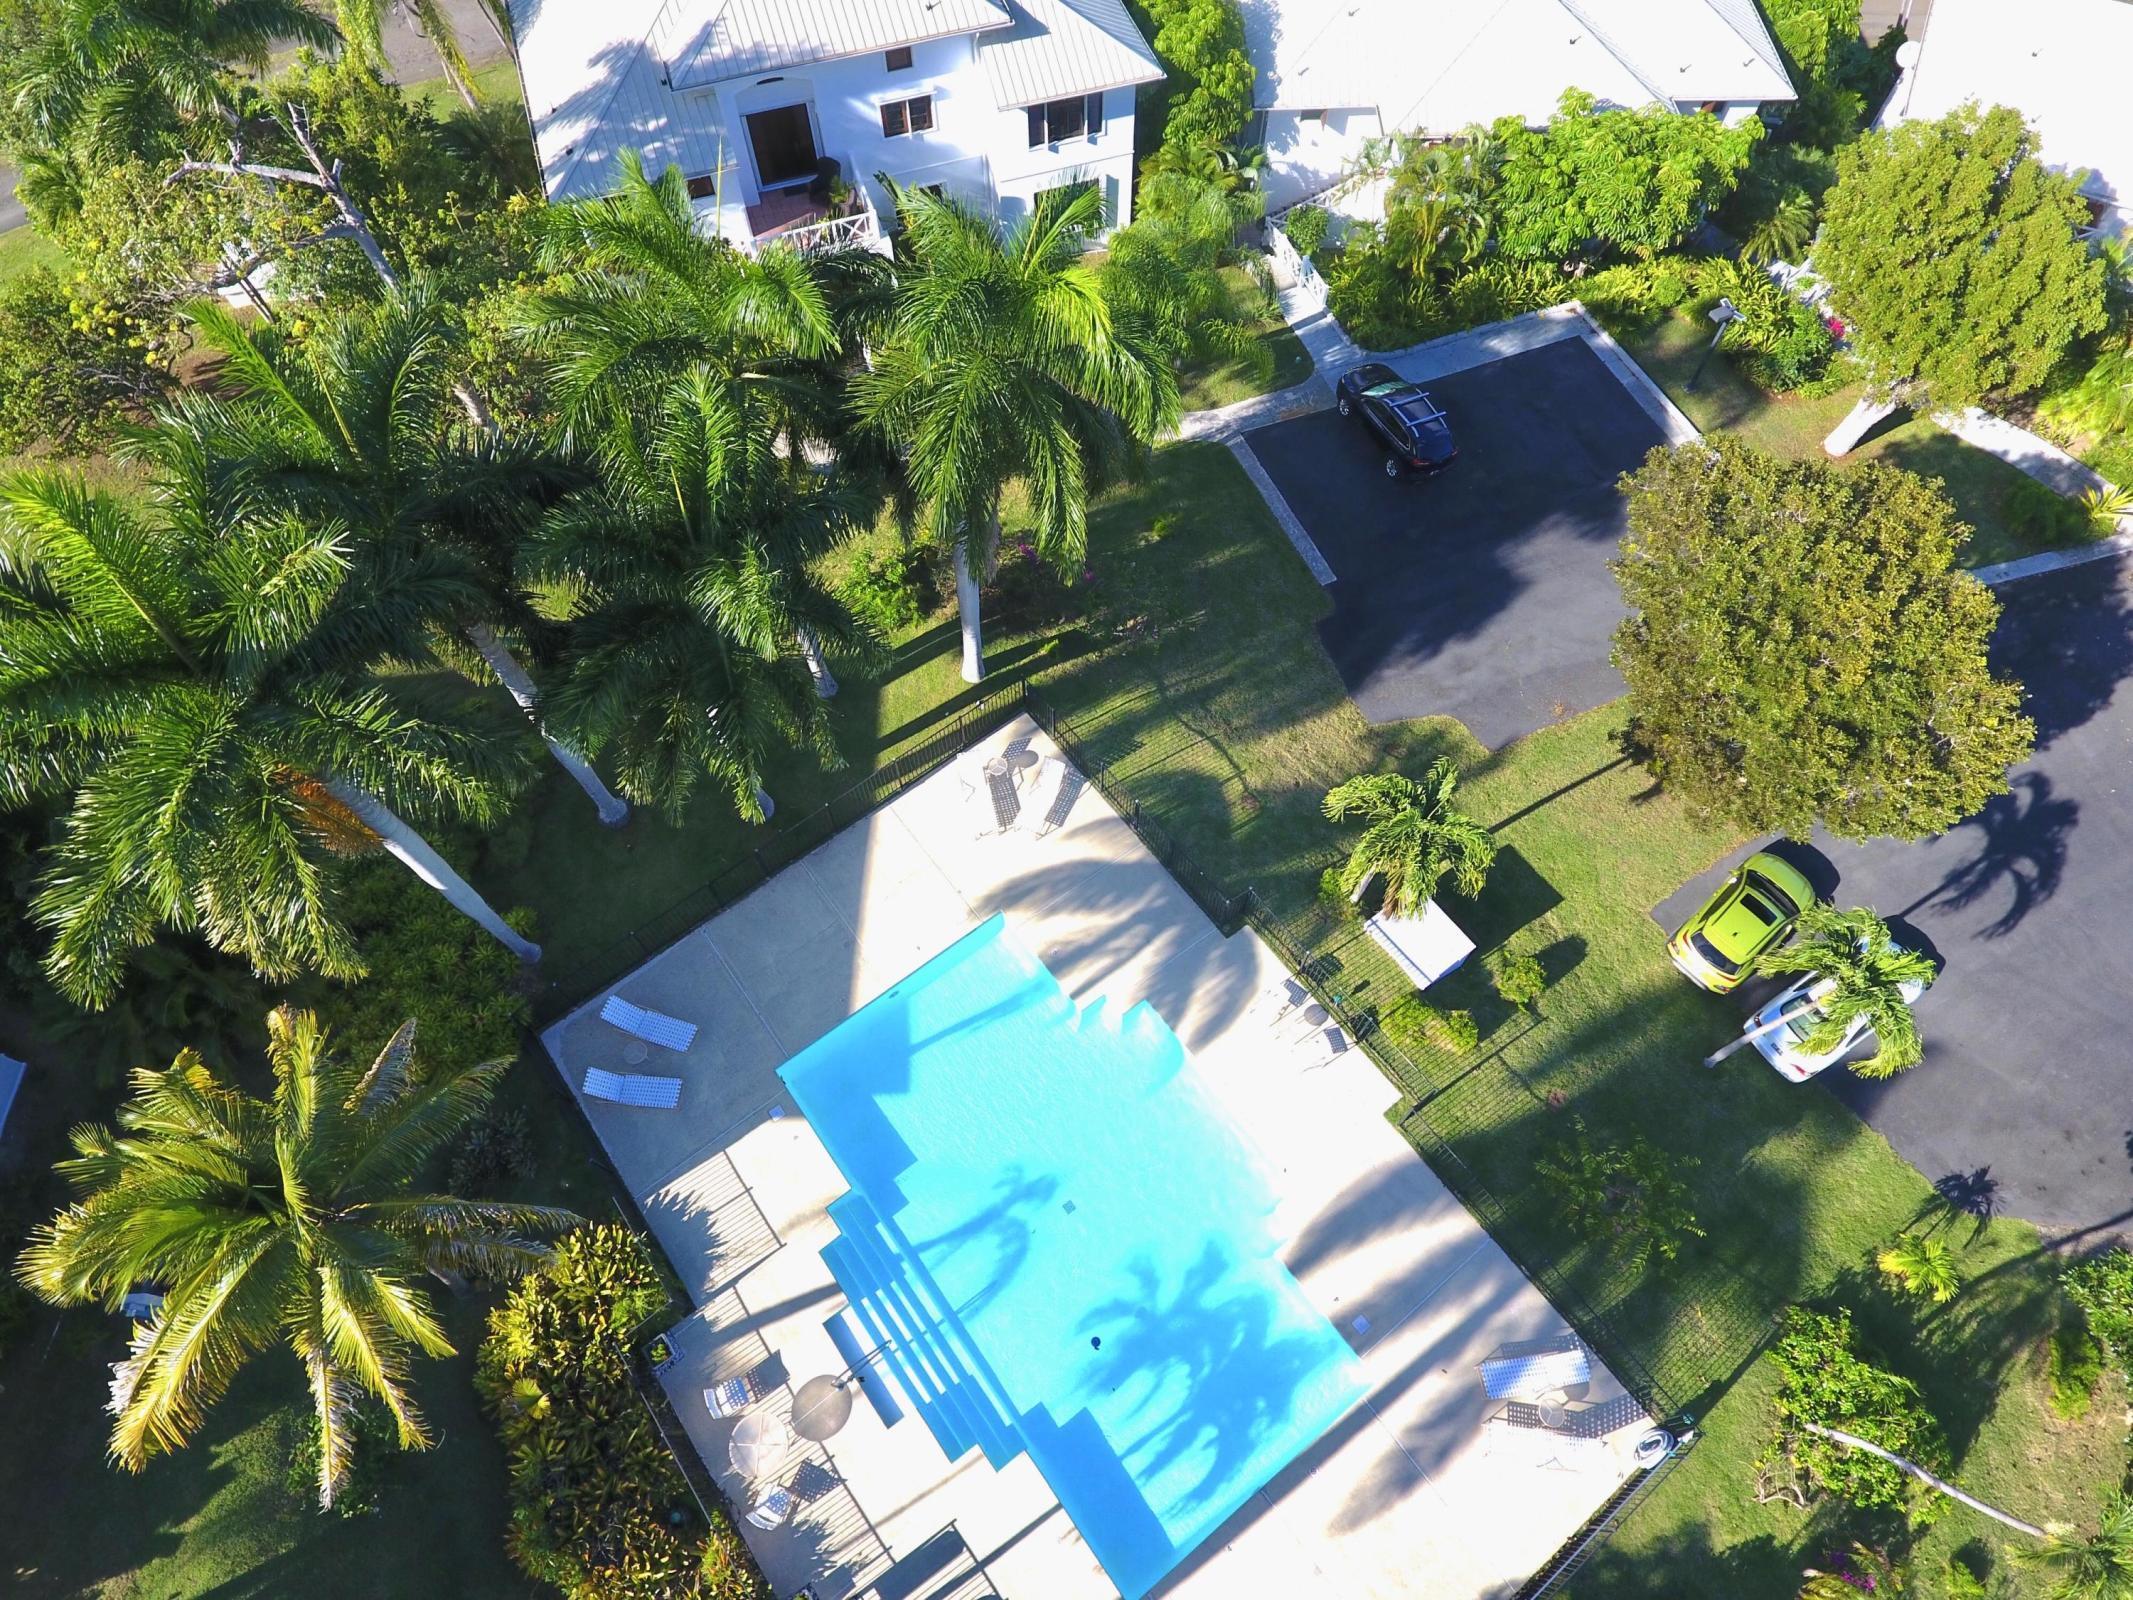 RE/MAX real estate, US Virgin Islands, River Estate, Price Reduced  Condo Rental  River PR